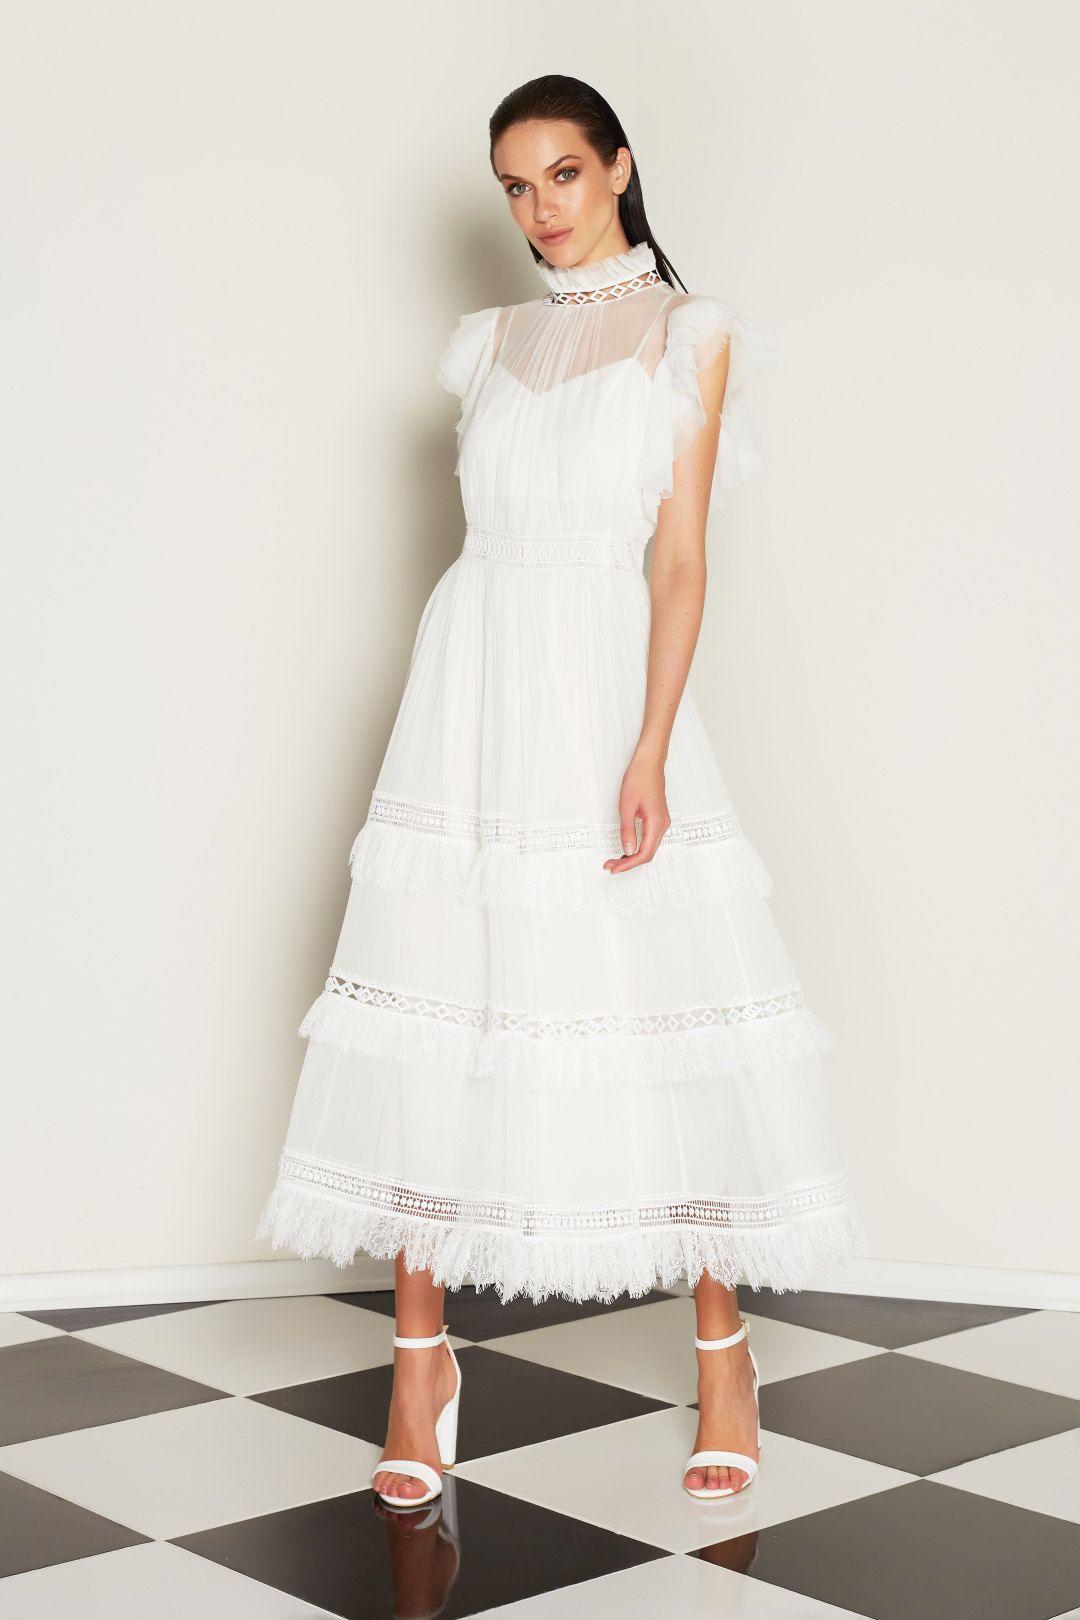 COPURS LONDON - Stella Beyaz Elbise | Davet çok elbisem yok | Dressy ...